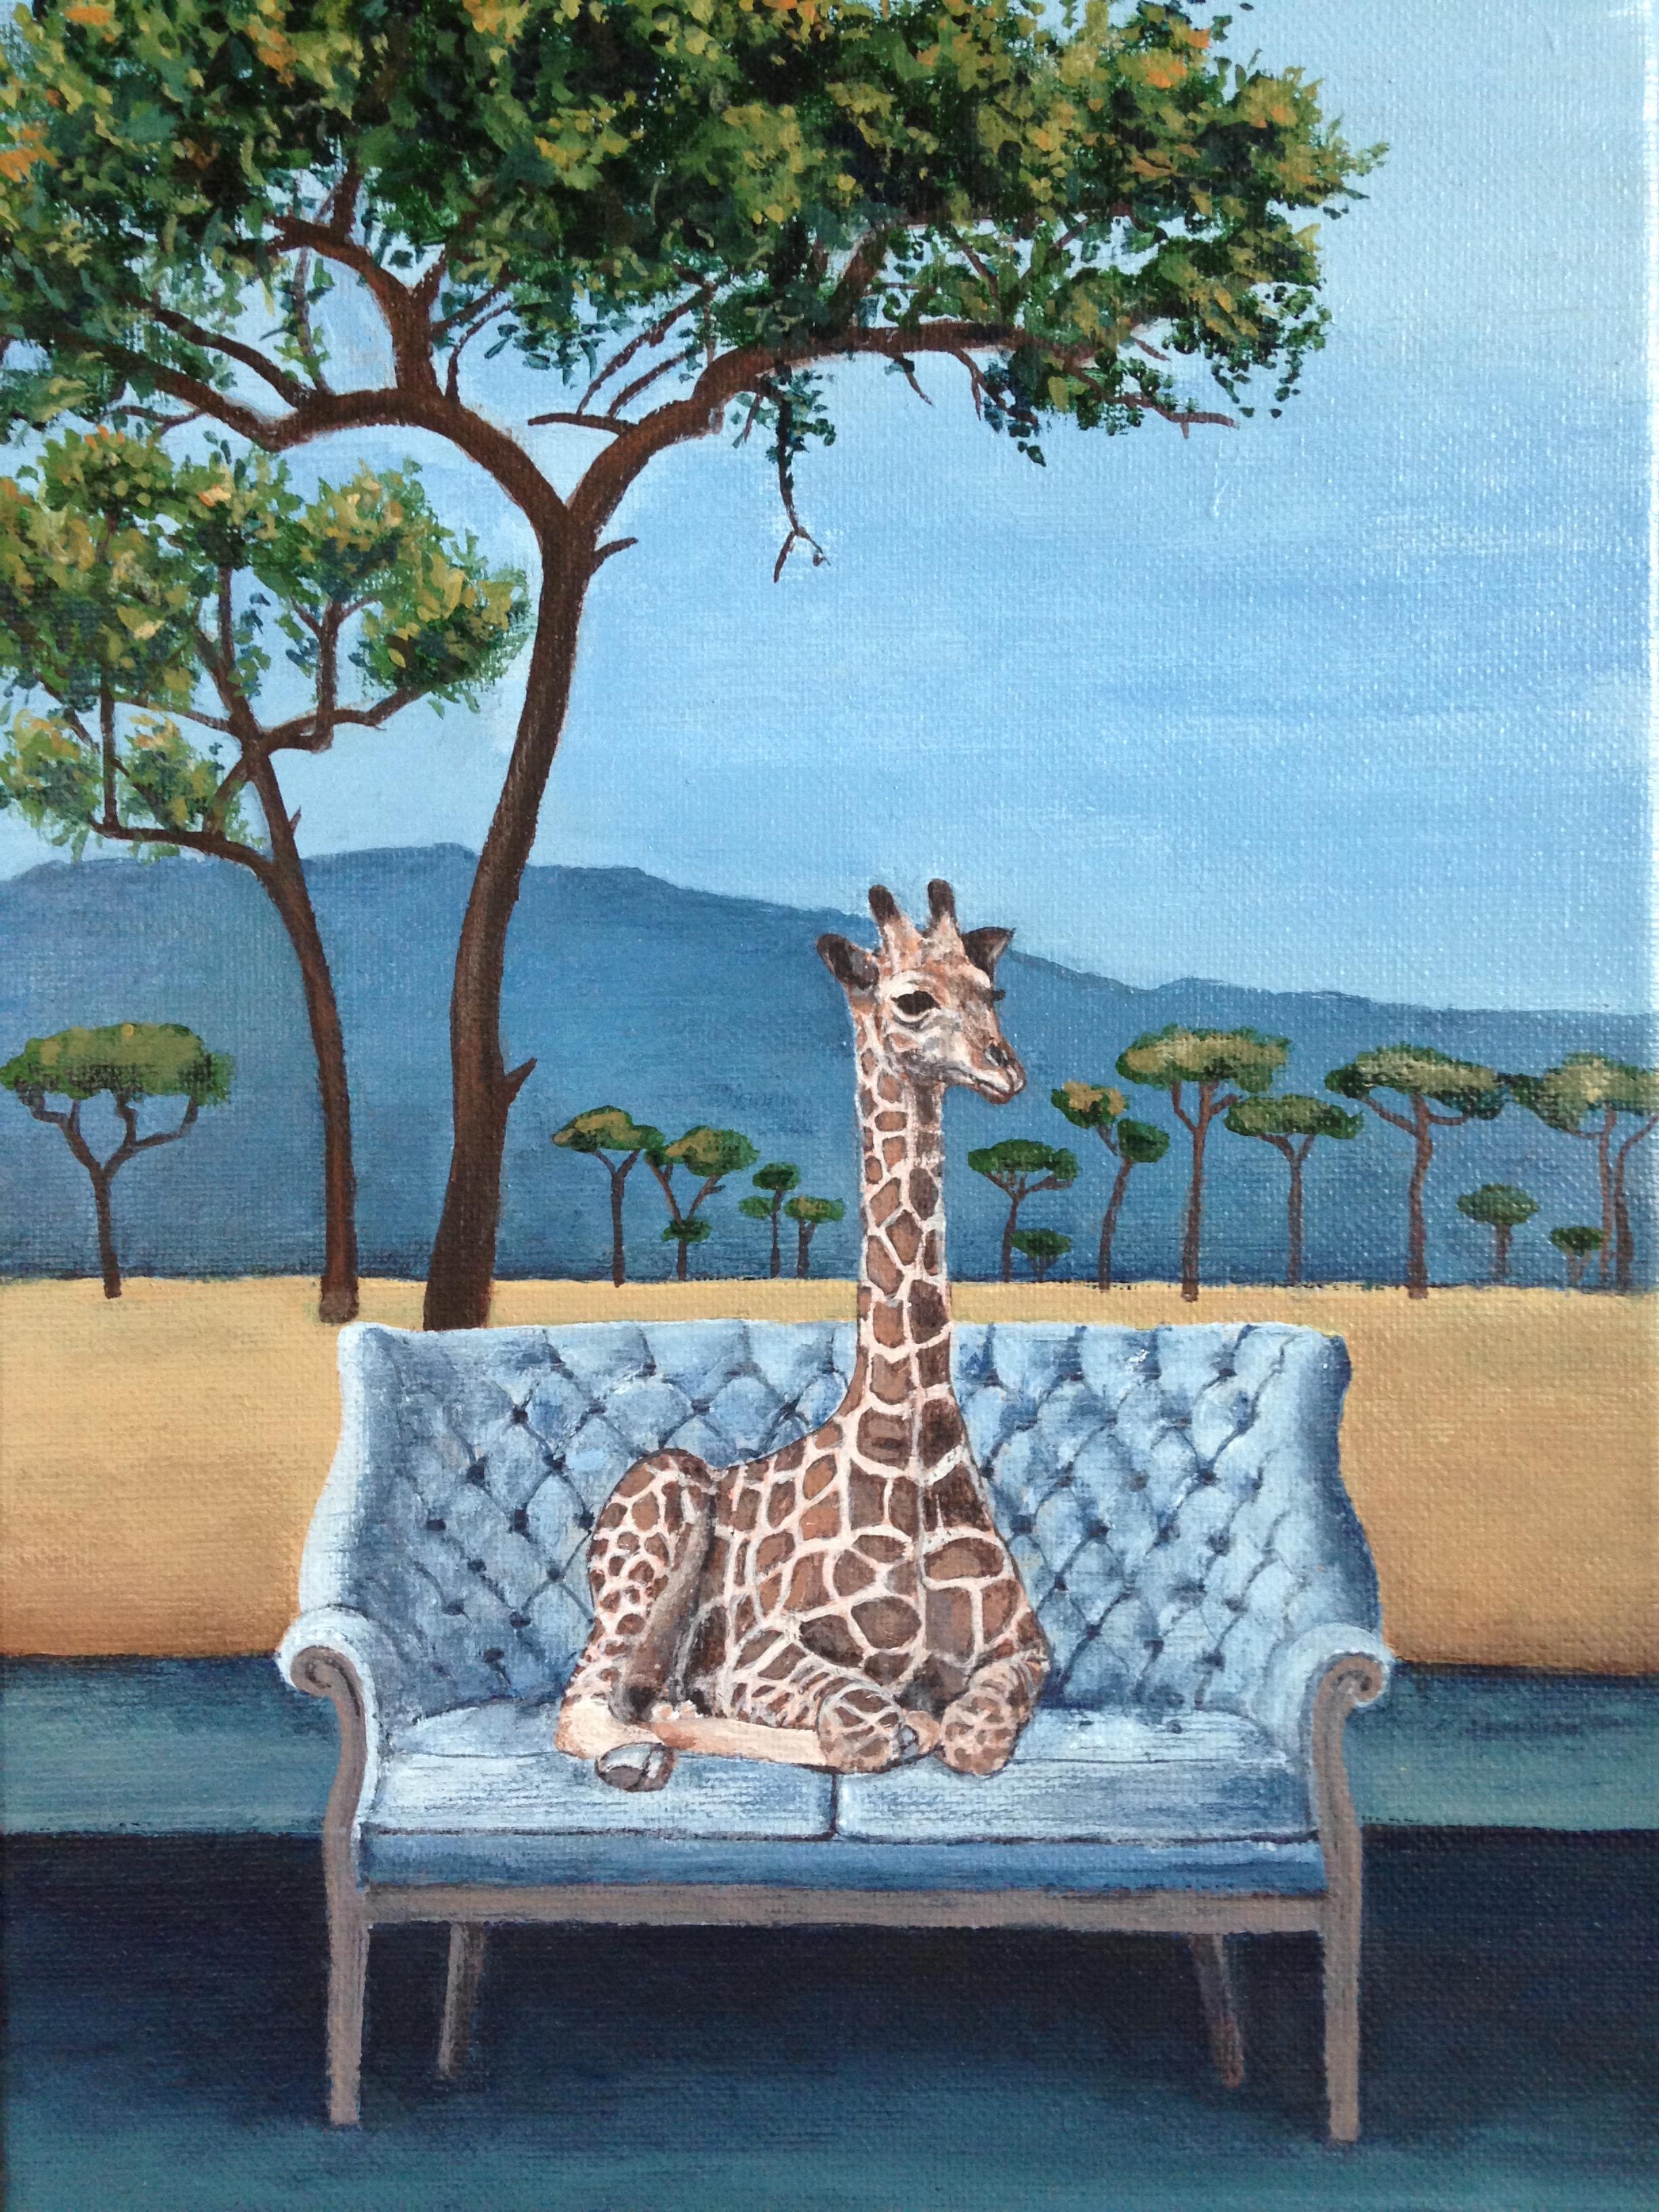 wise giraffe, 9''x12'', acrylic on canvas, 2016